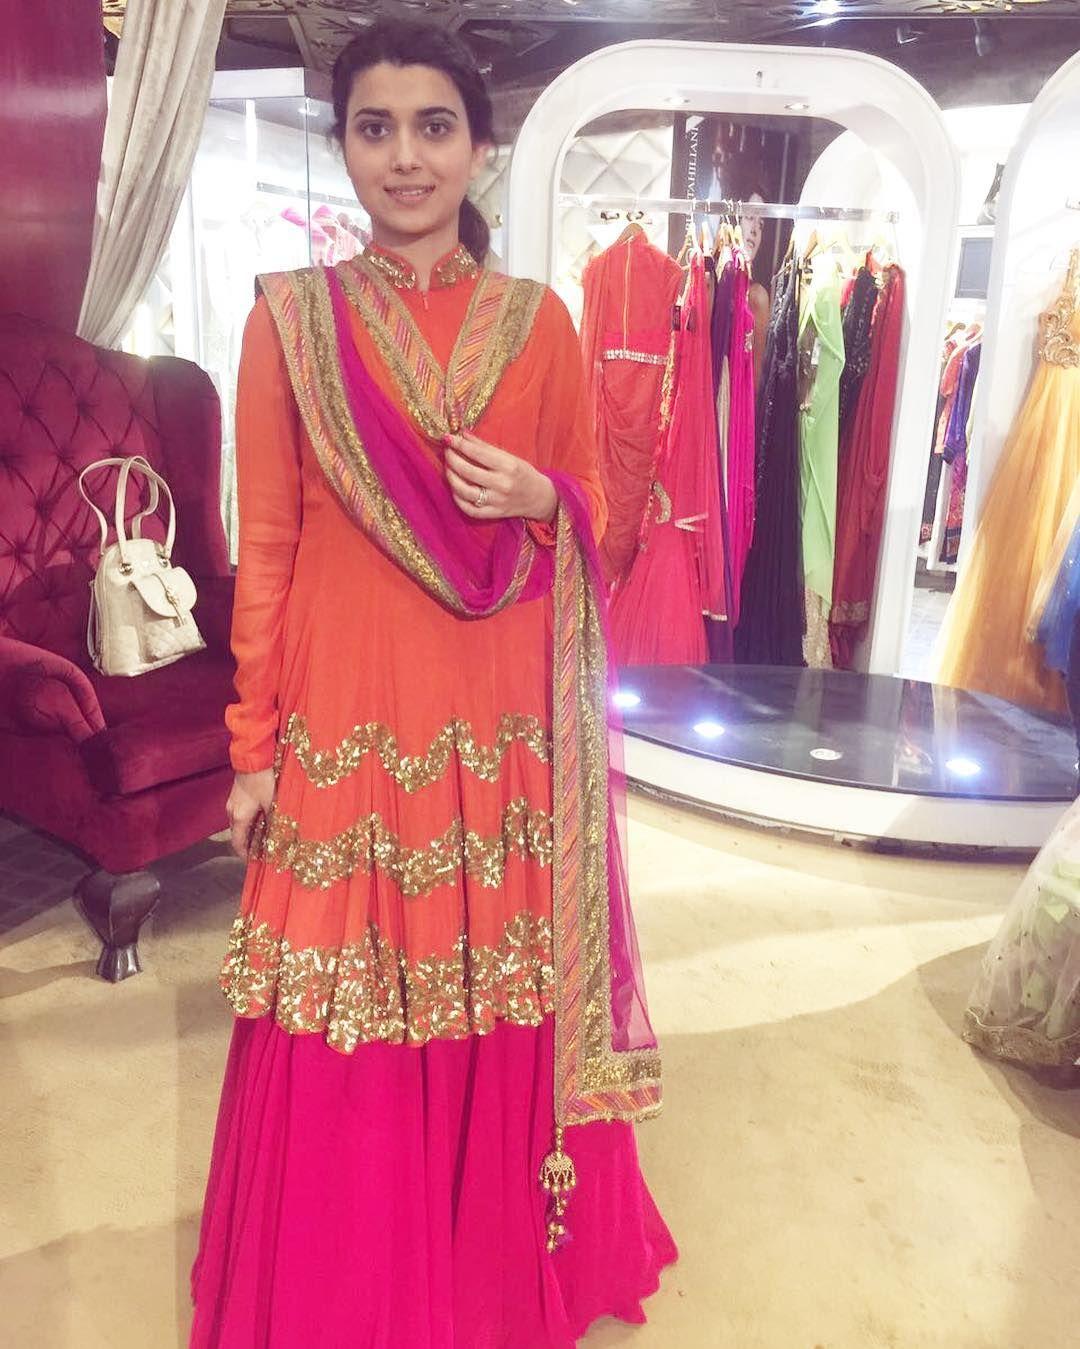 a line kali daar long kurta w sharara/lengha orange pink | fav ...